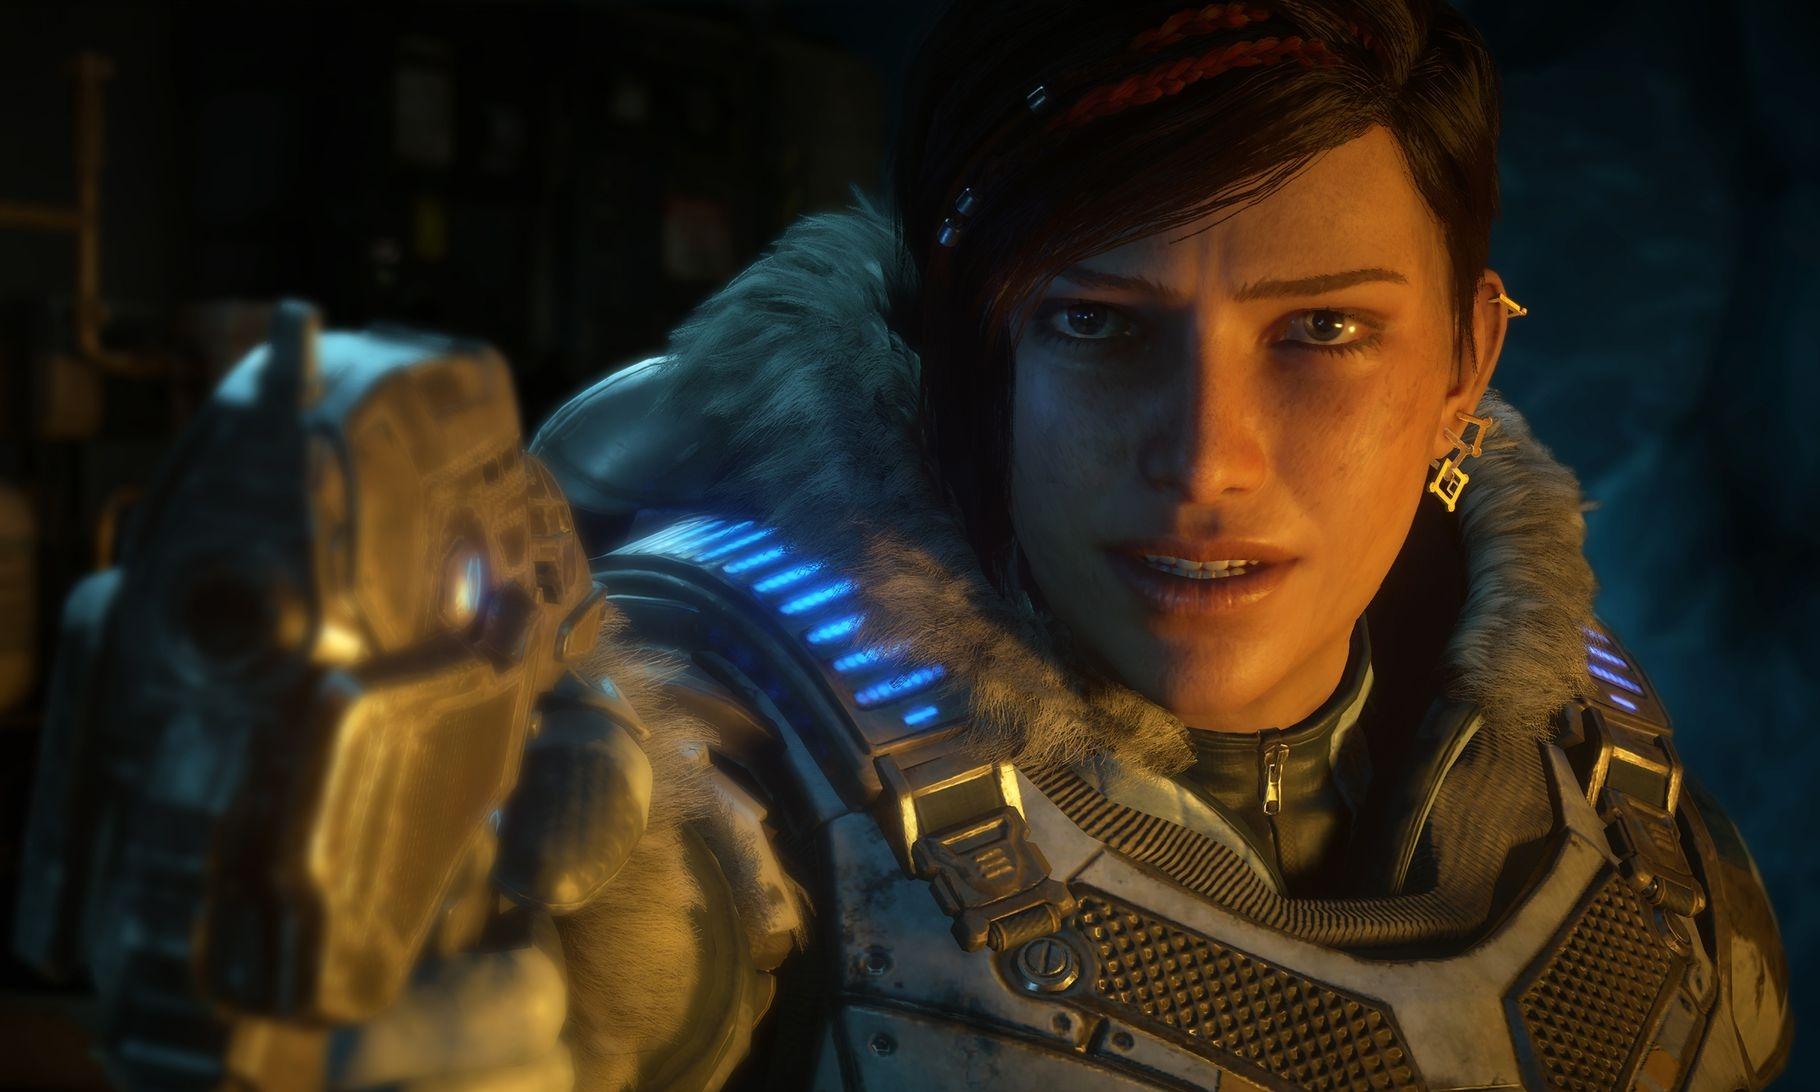 Kait Diaz, the protagonist of Gears 5